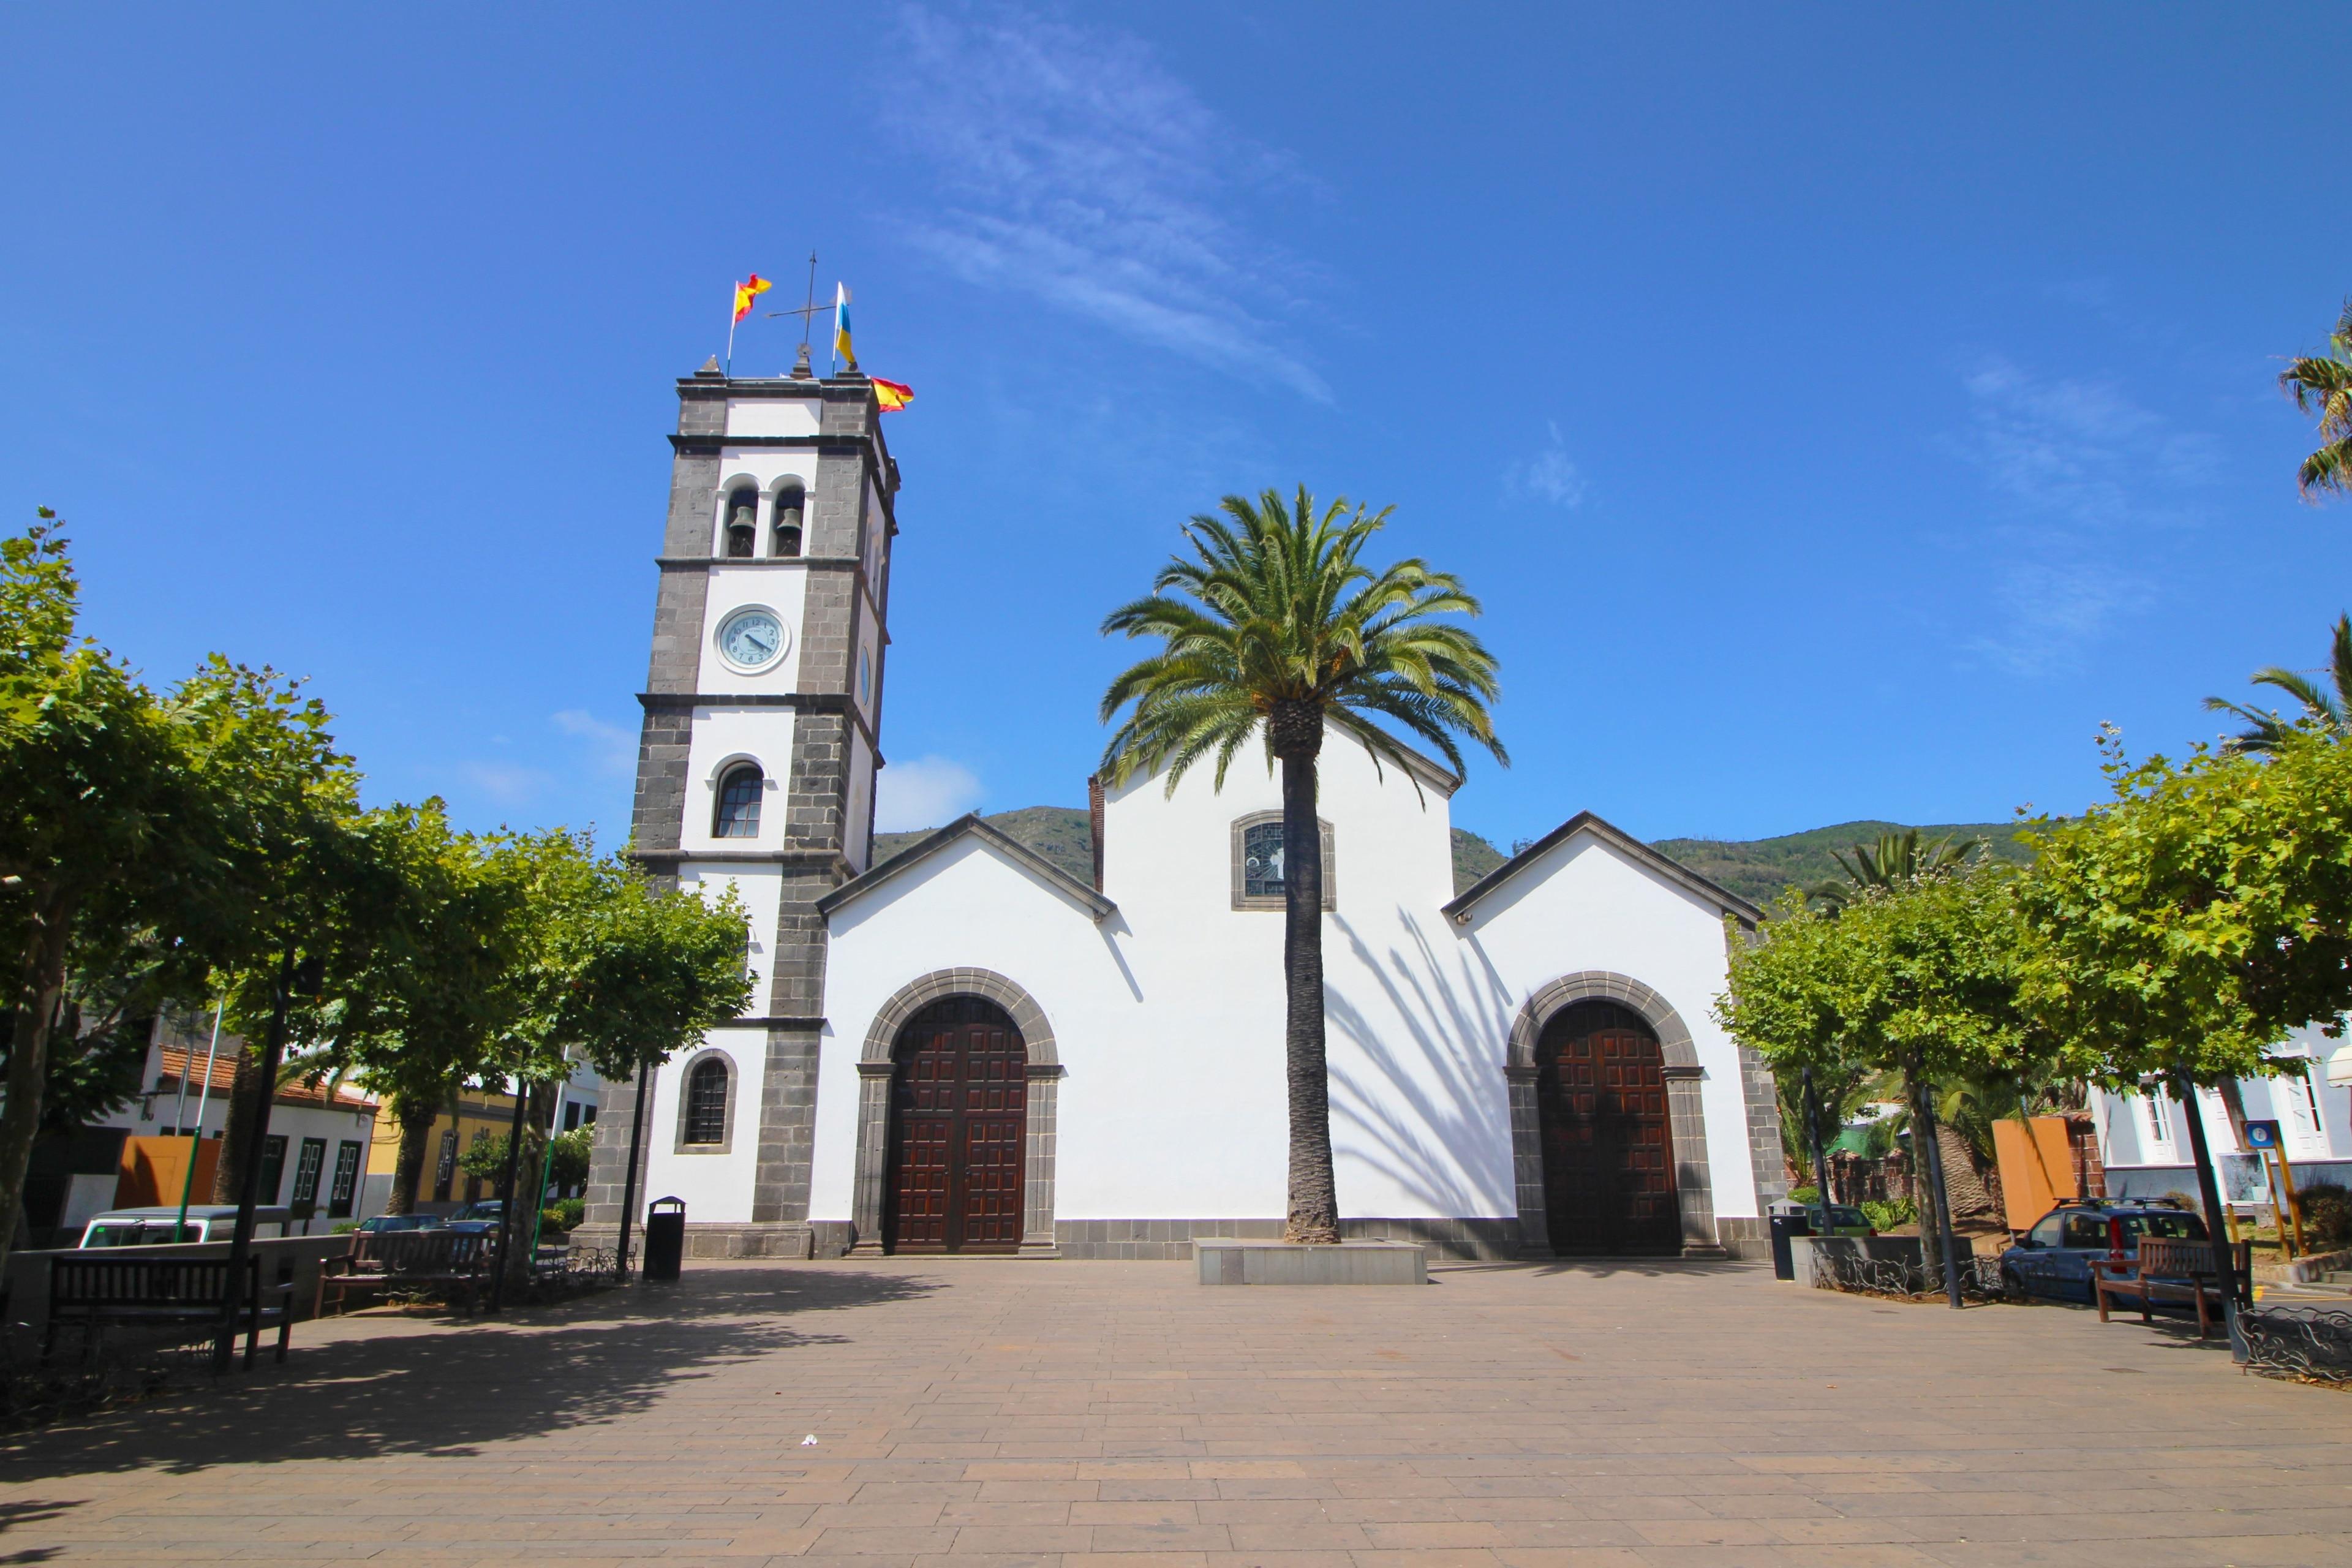 Tenerife, Canary Islands, Spain